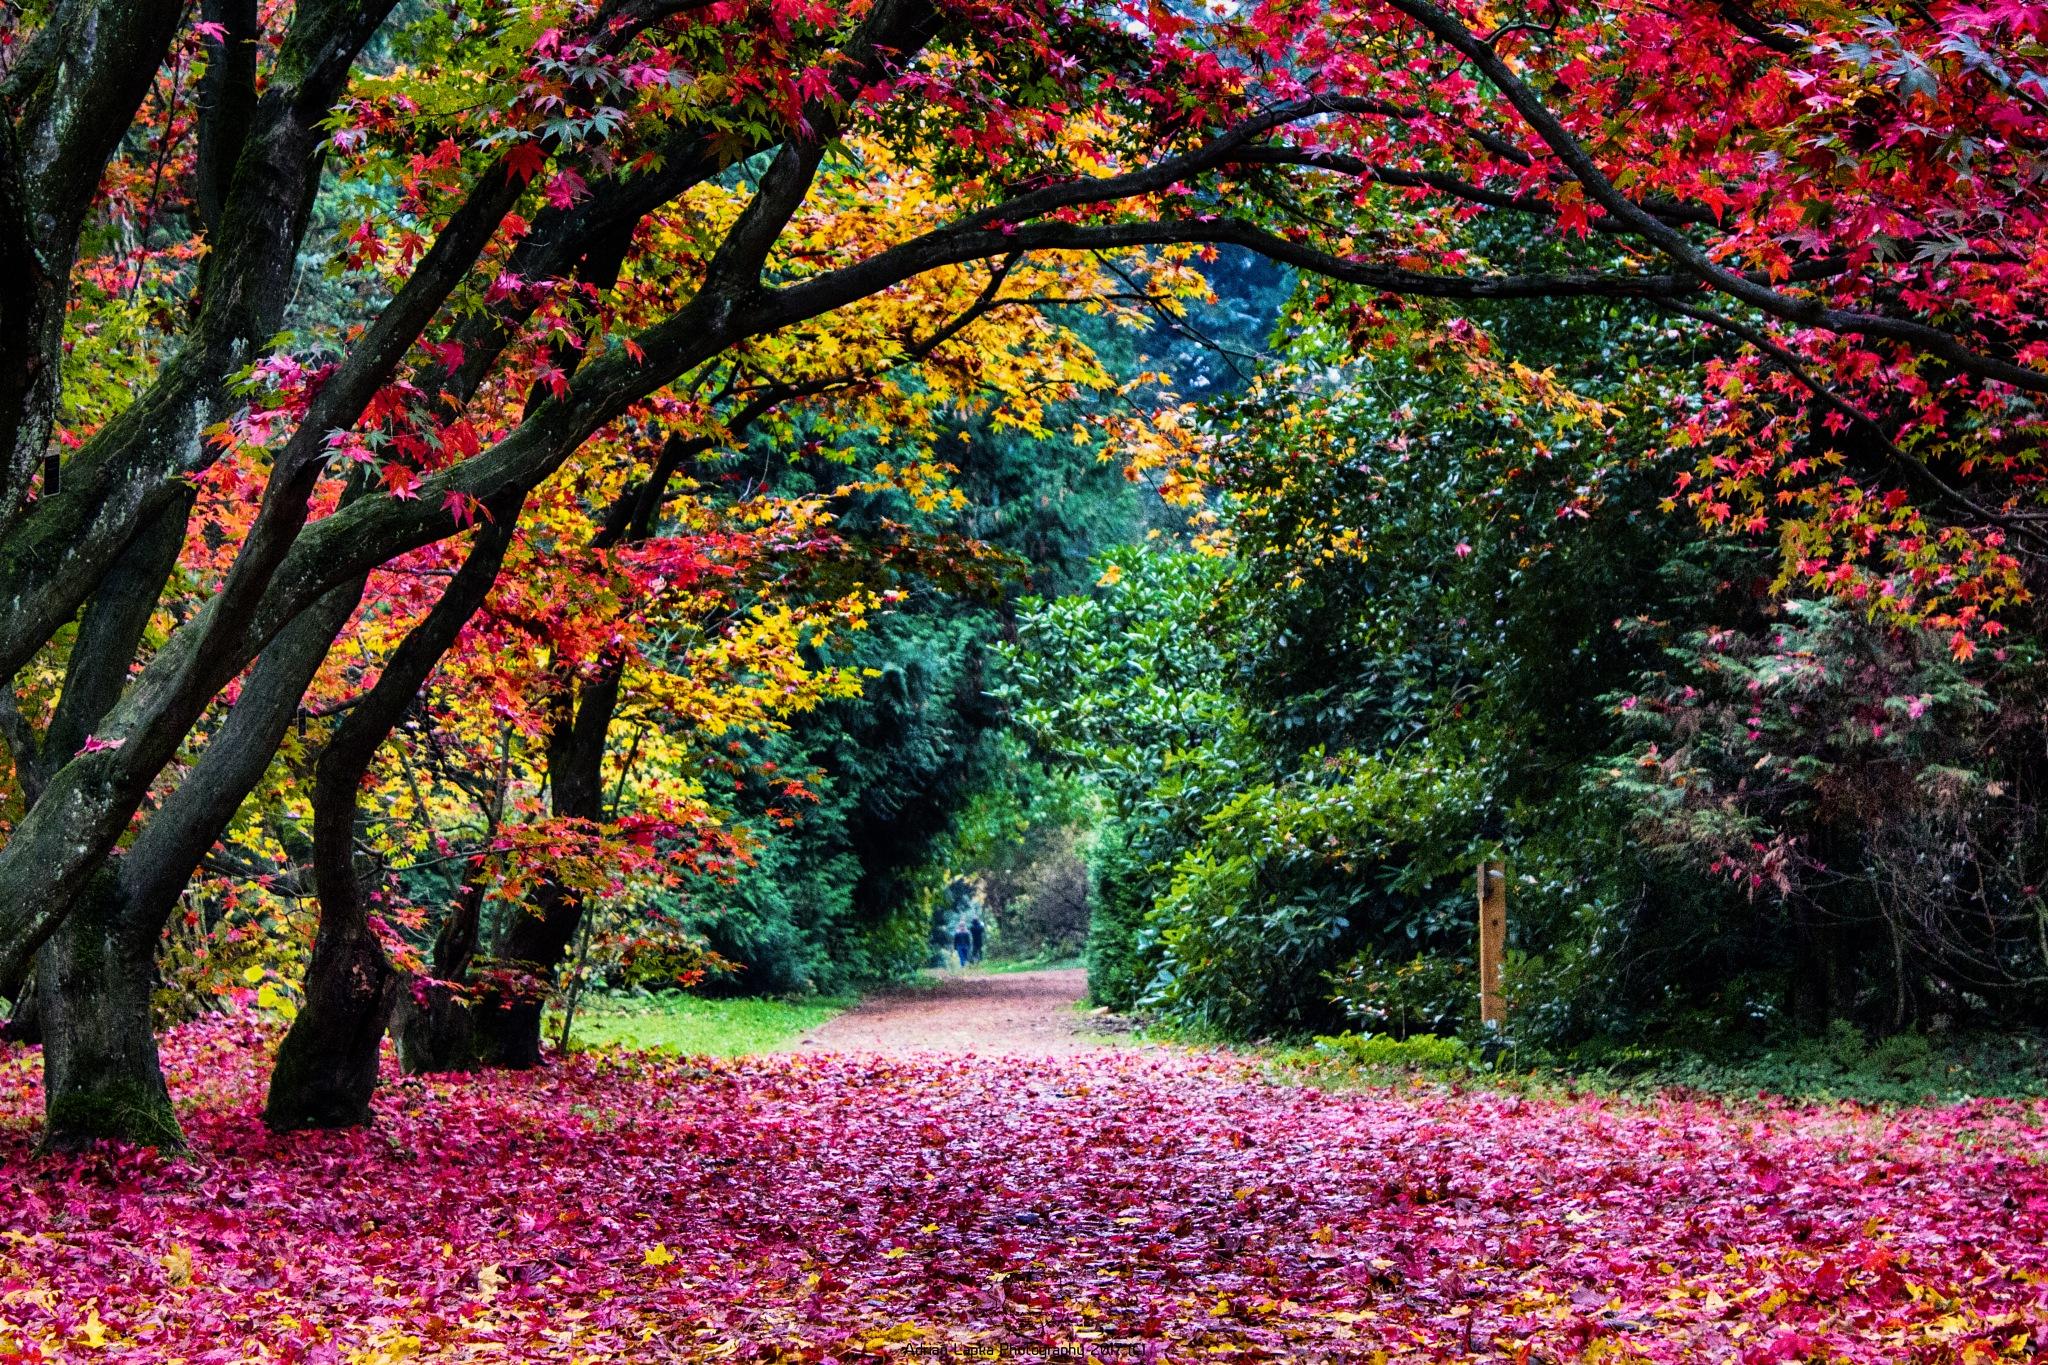 jesień w arboretum by Public Transport Photography